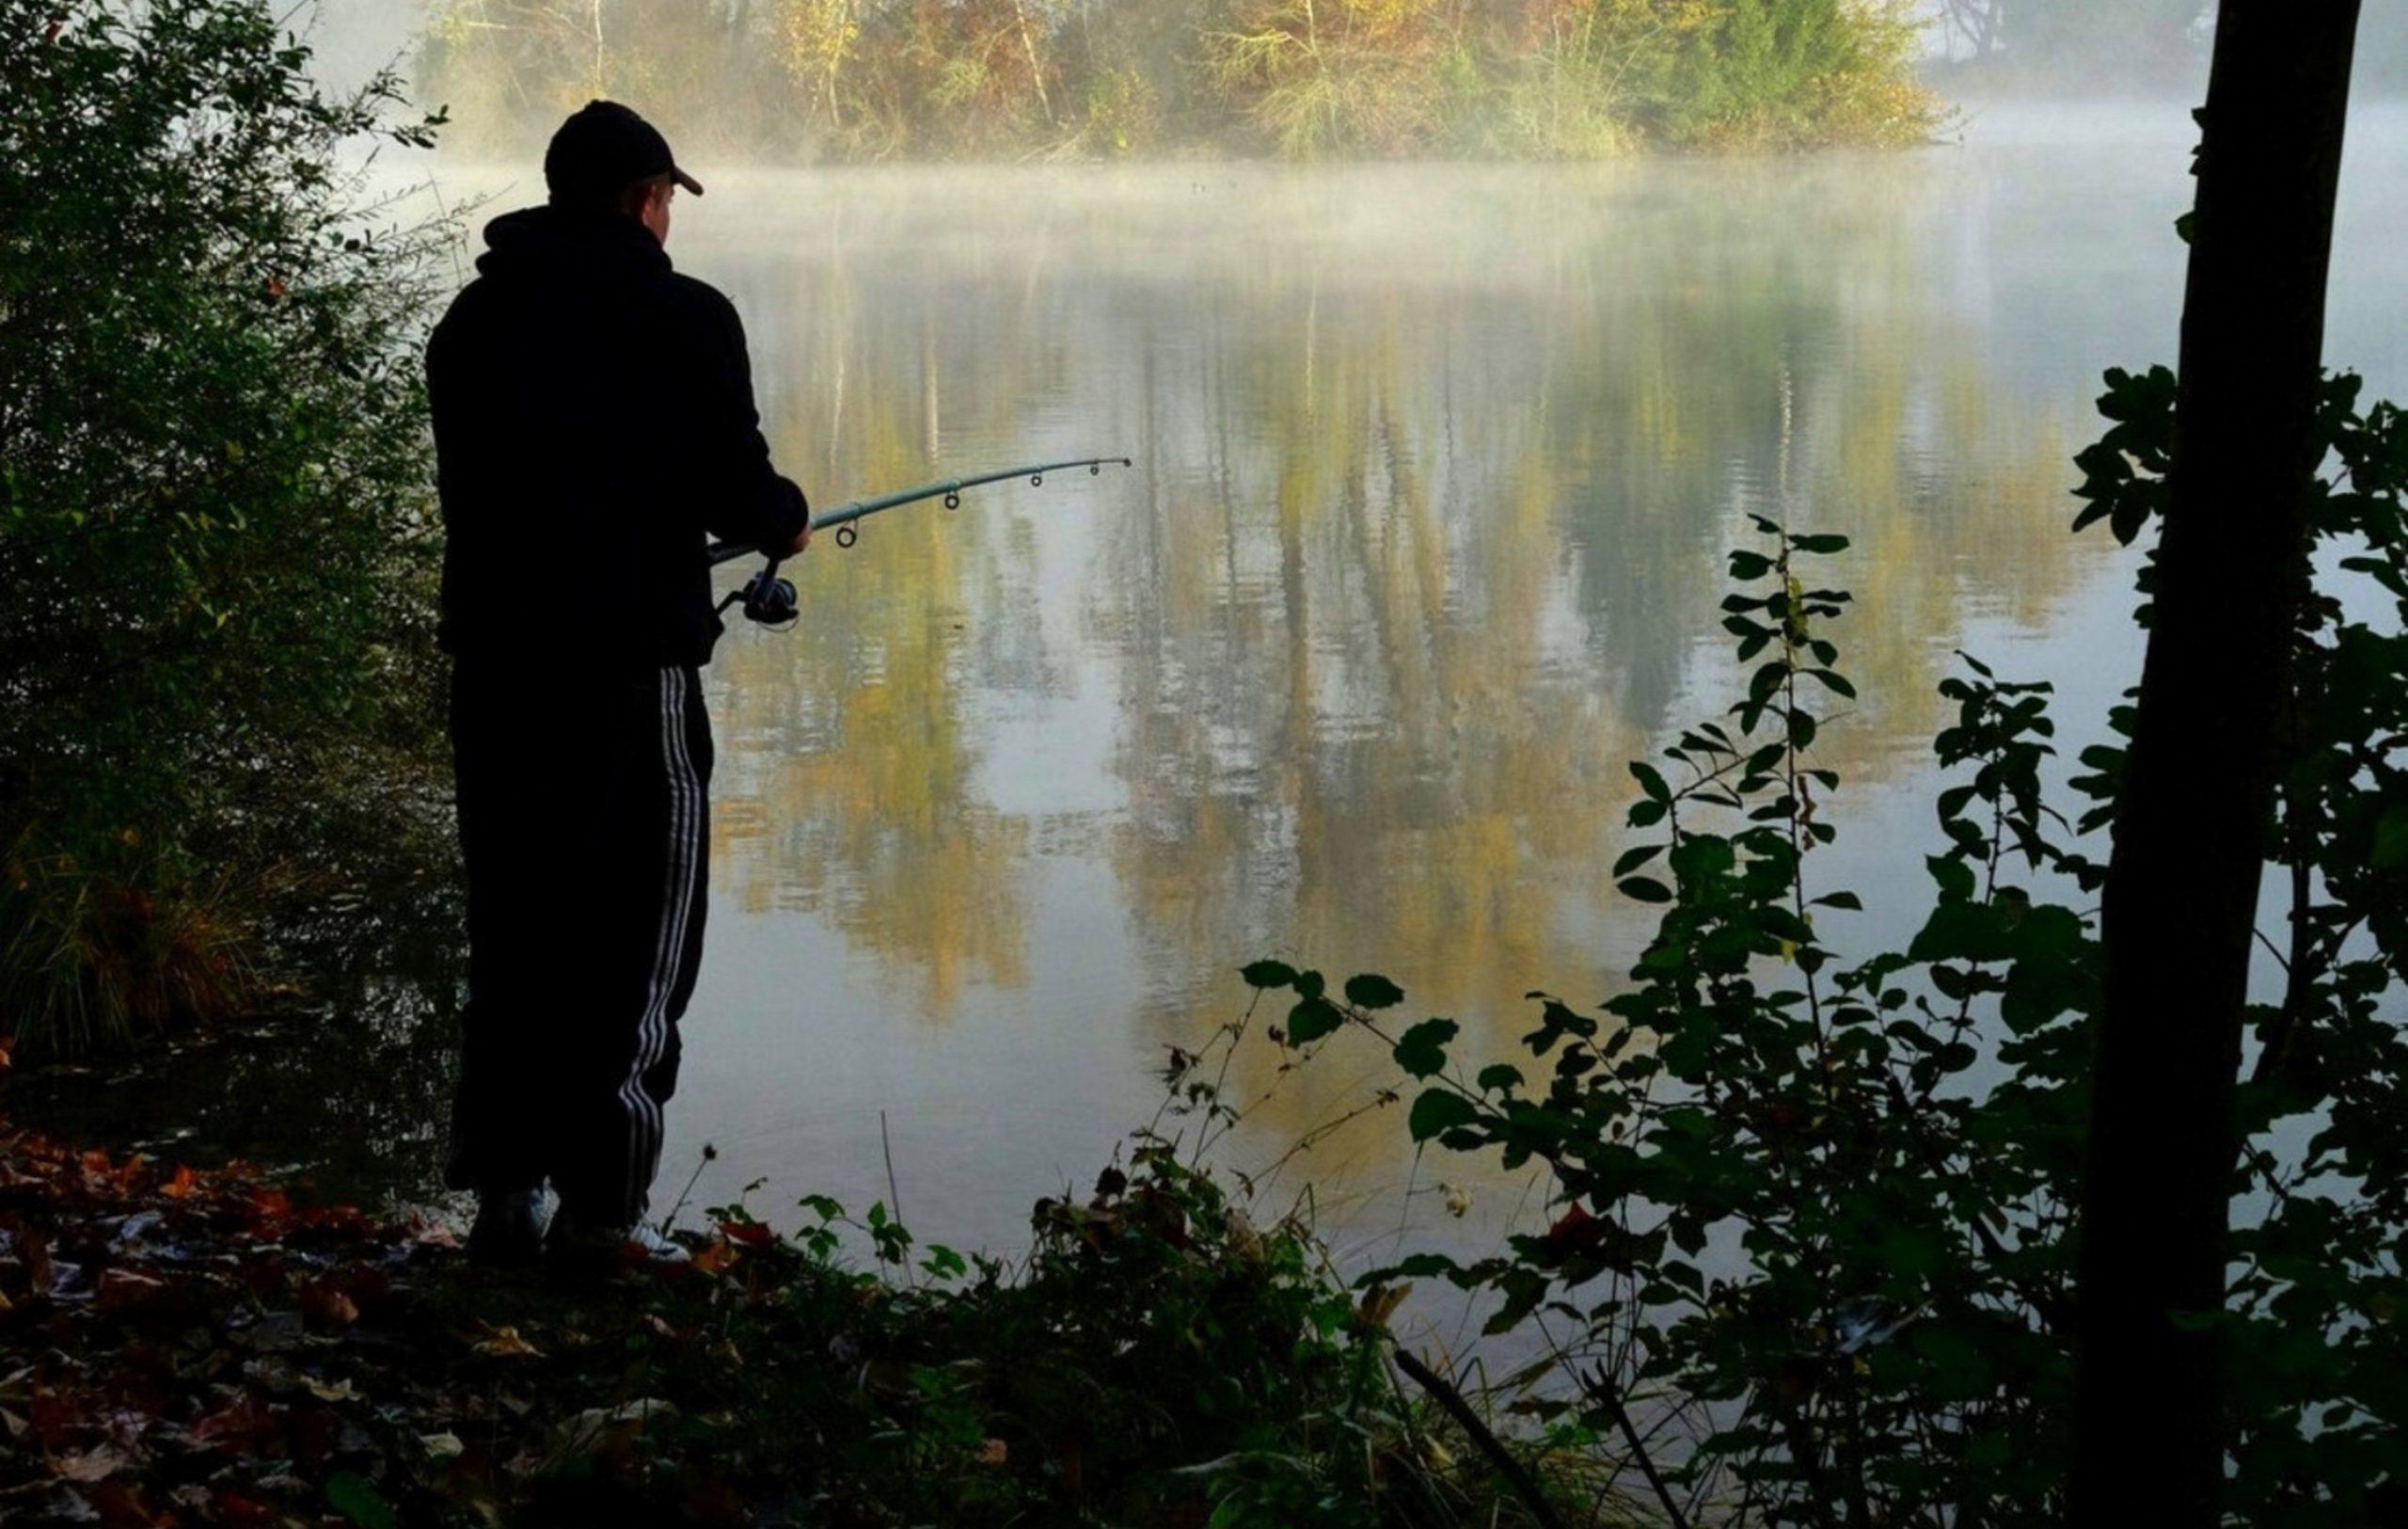 Memancing dengan tenang di danau